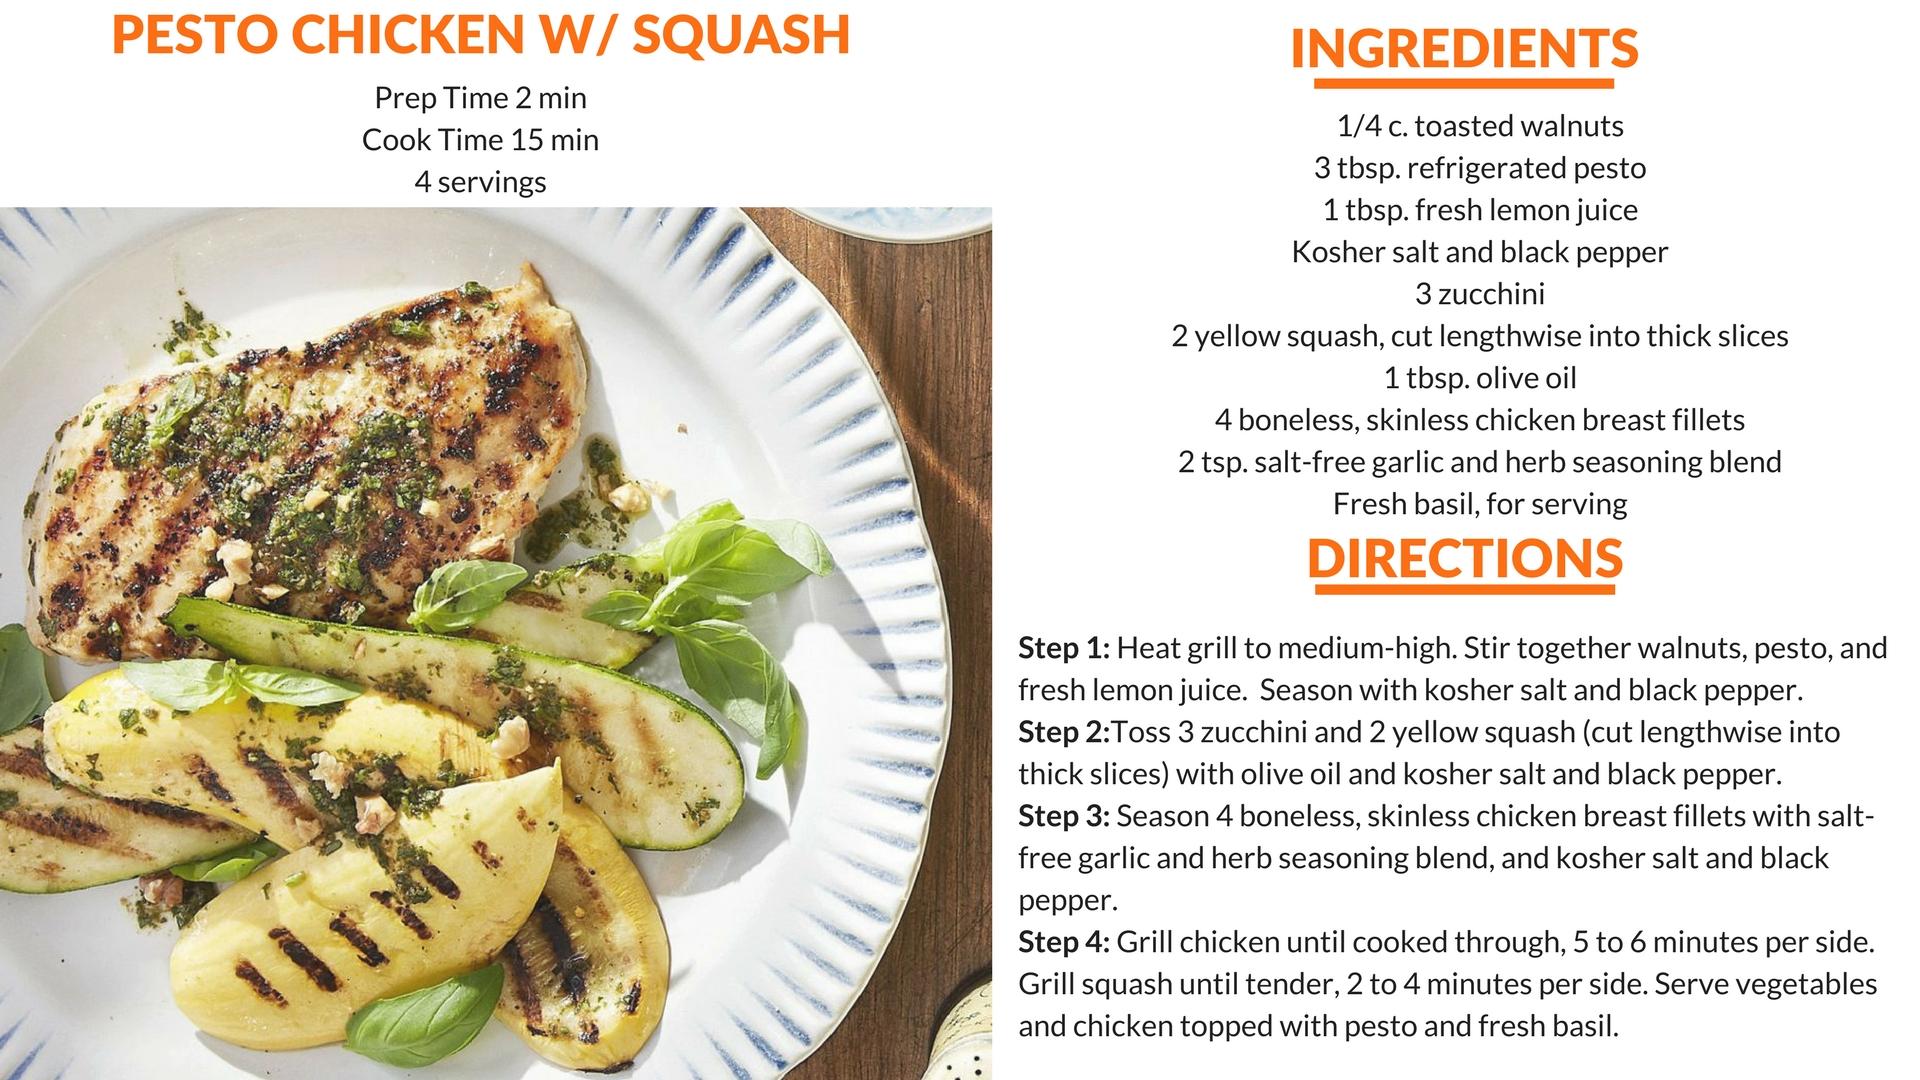 Pesto Chicken With Squash